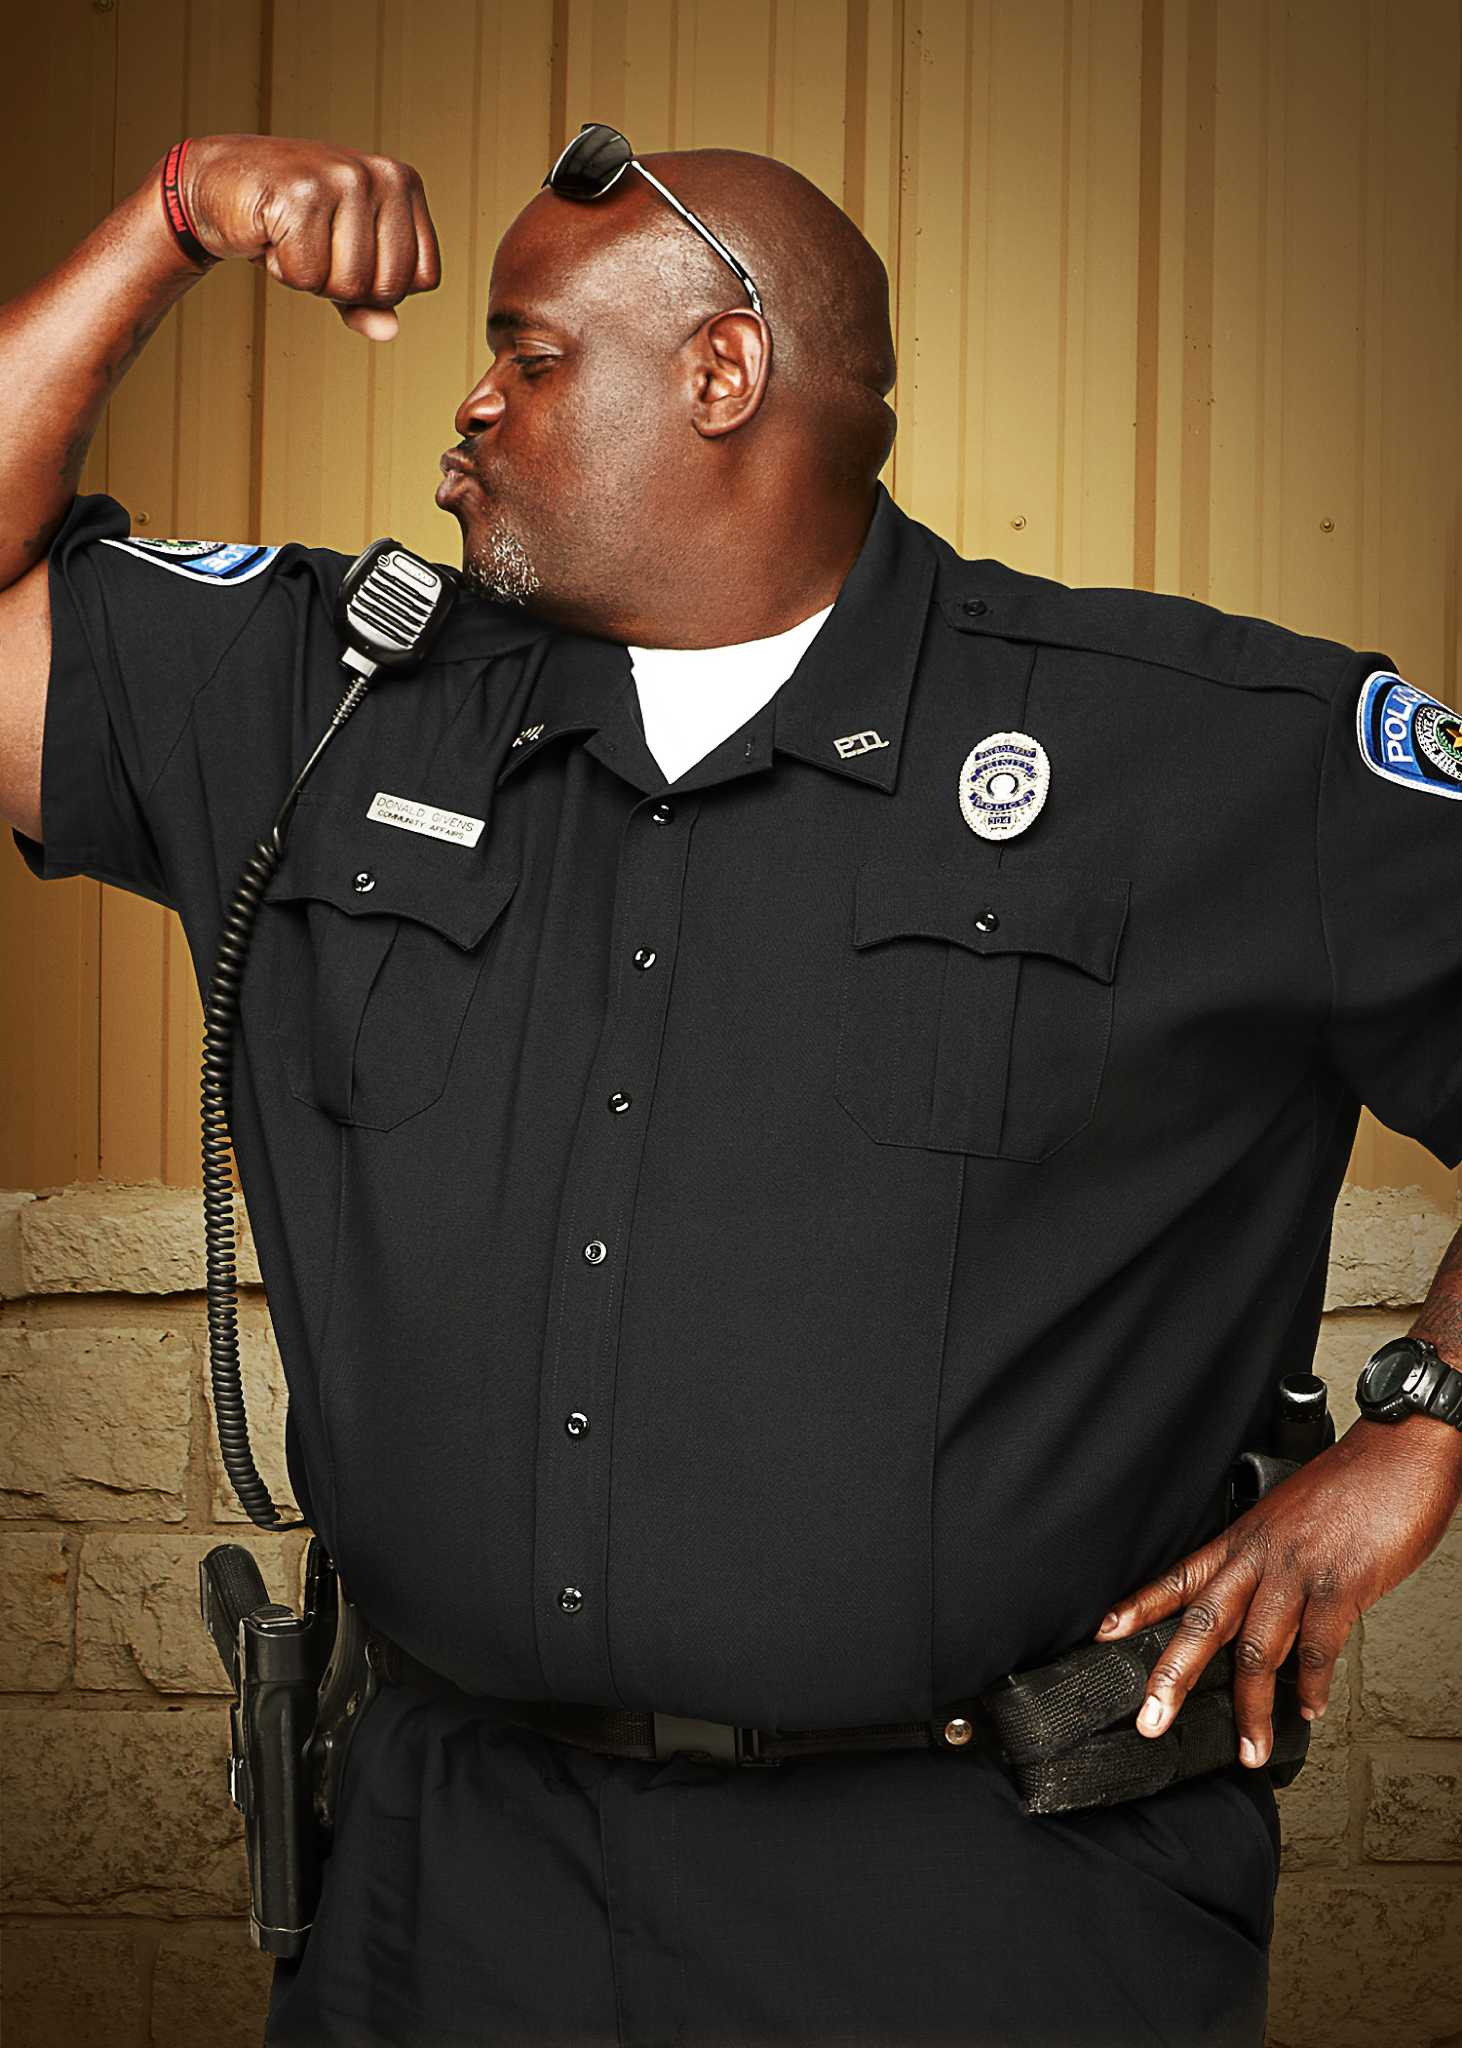 Trinity police force gets reality show